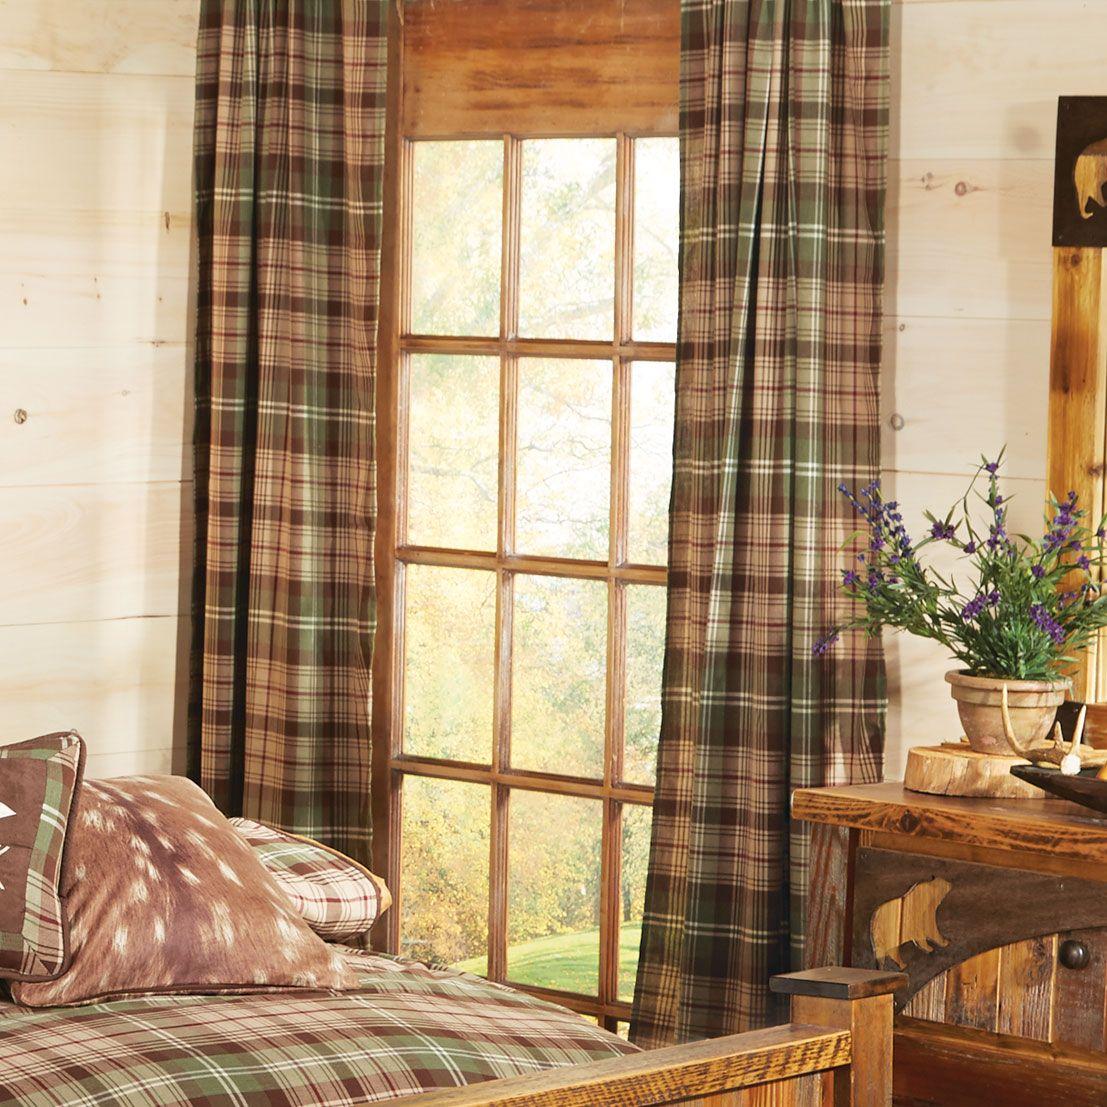 ... cabin window treatments and lodge style curtains. Durango Plaid Curtain